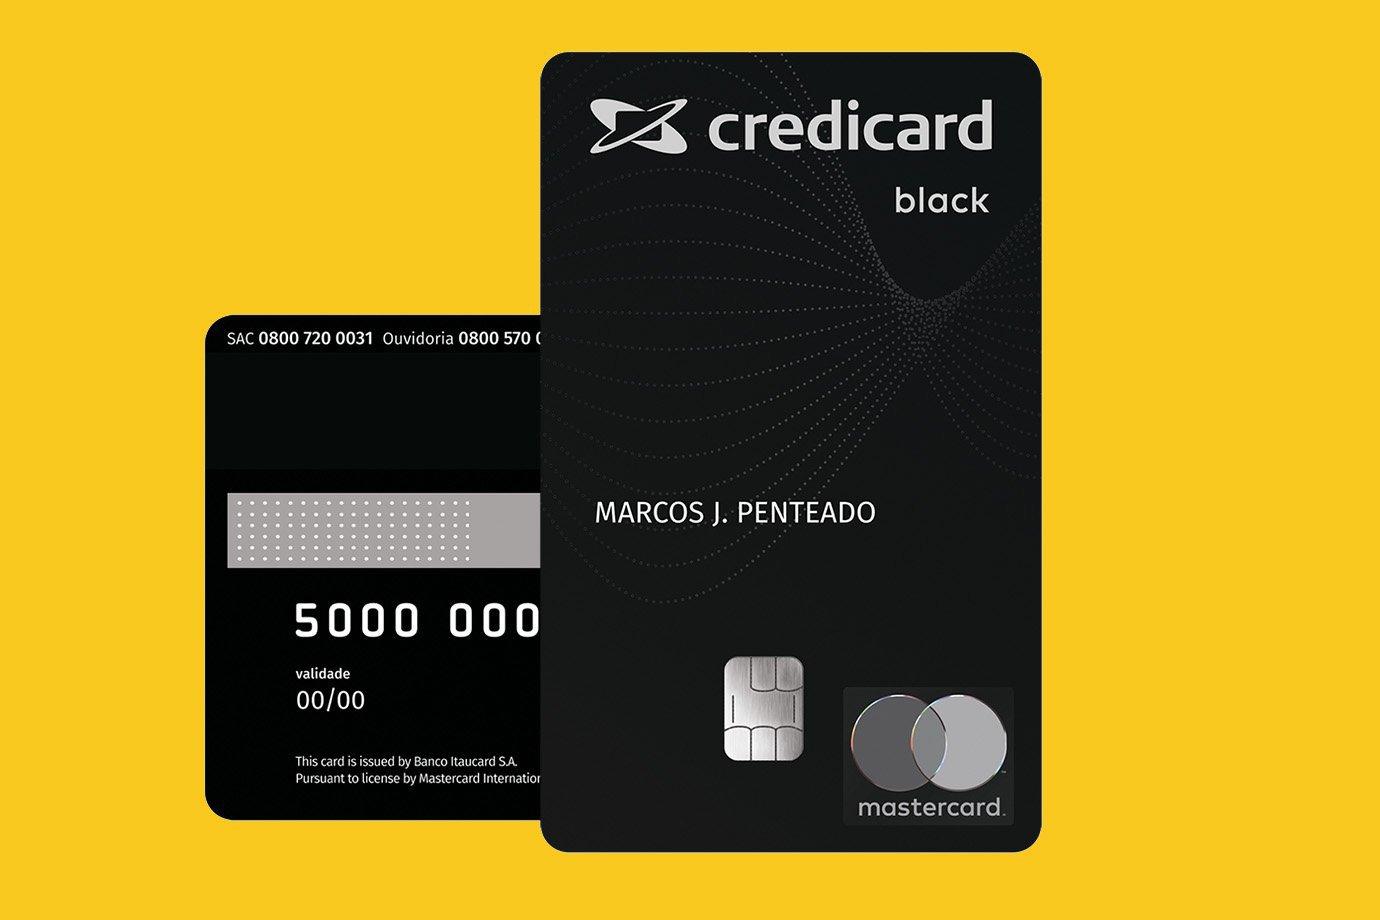 Credicard Mastercard Black